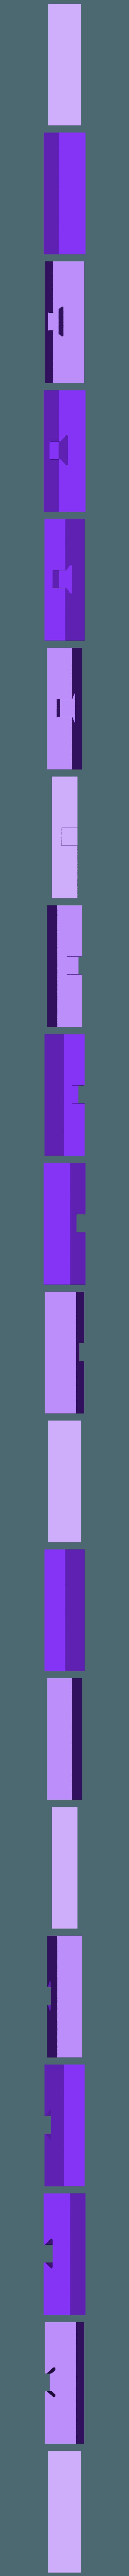 25mm_Stripper_Clip_1x_v5_F-End.stl Download free STL file 25mm Base Slide Tray Scale-able • 3D printable object, aLazyCamper